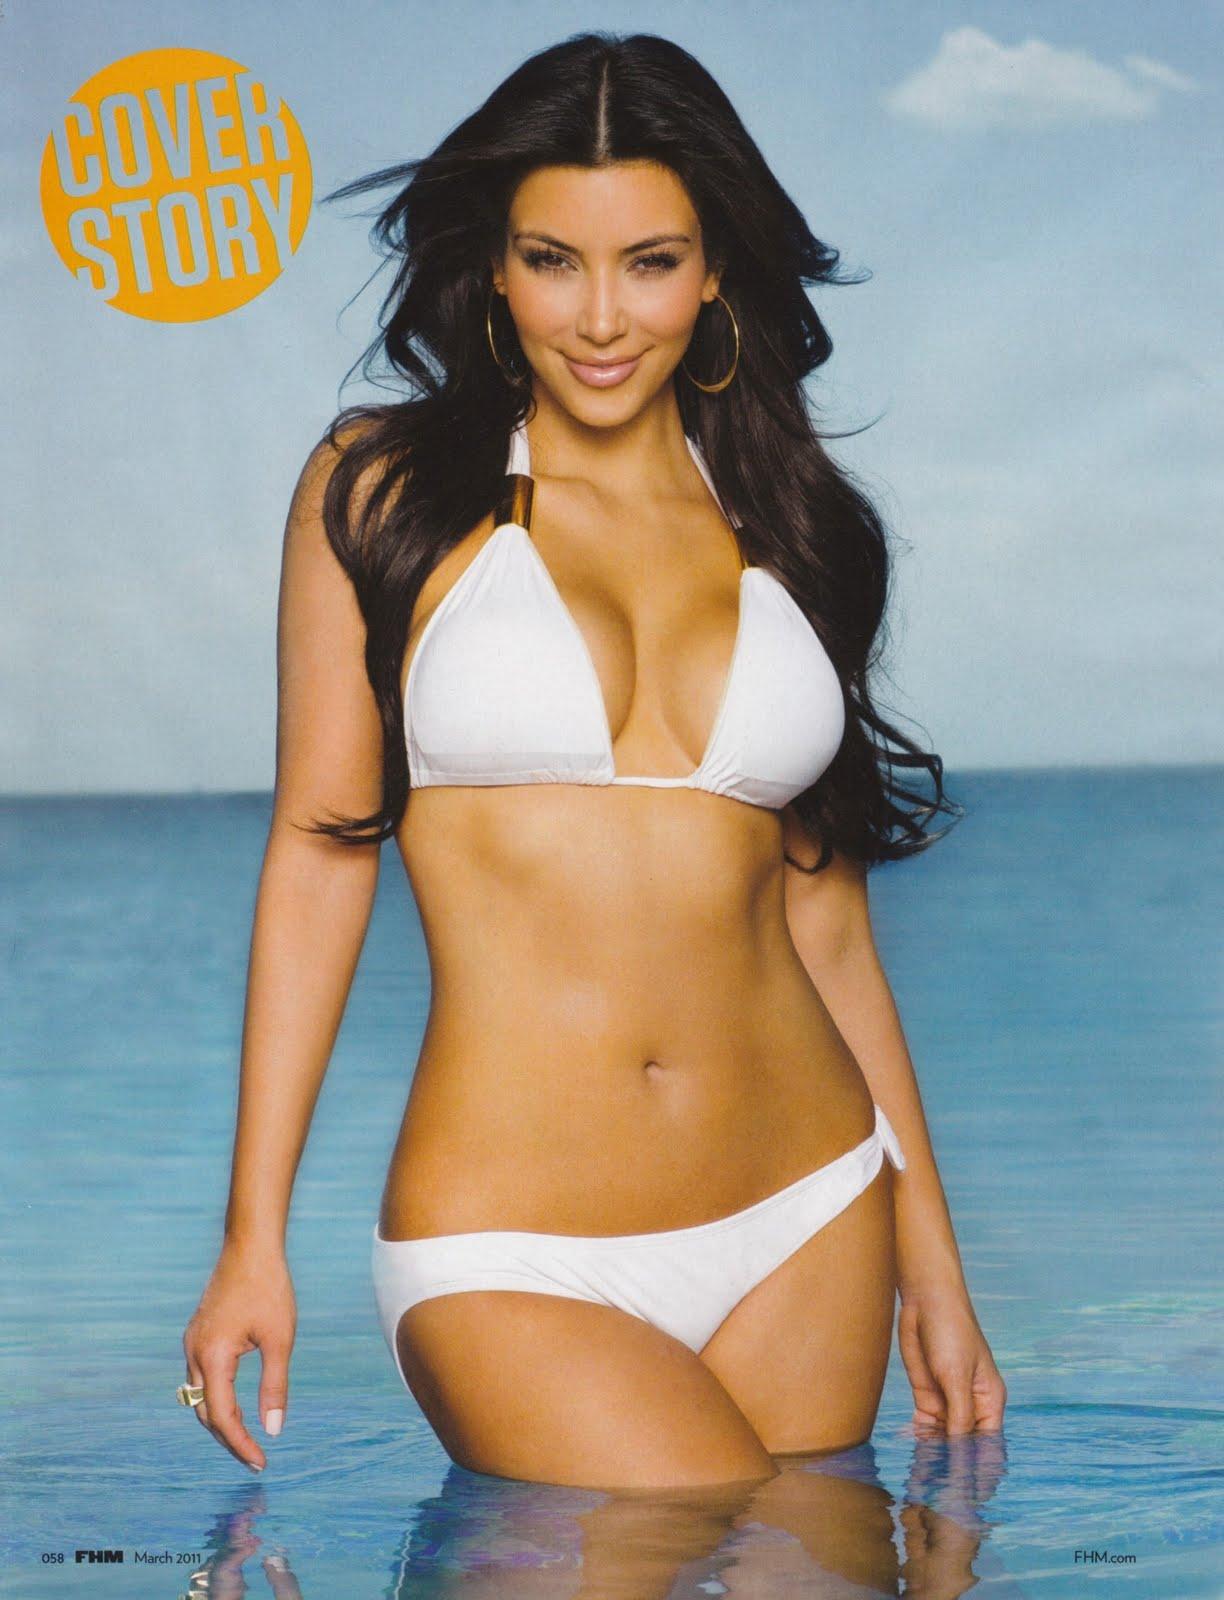 http://4.bp.blogspot.com/-fUnBk_OGLnM/TbPWAih6bKI/AAAAAAAABOI/cmZaKmilSA4/s1600/Kim+Kardashian+in+Quick+Trim+body+Promo+4.jpg